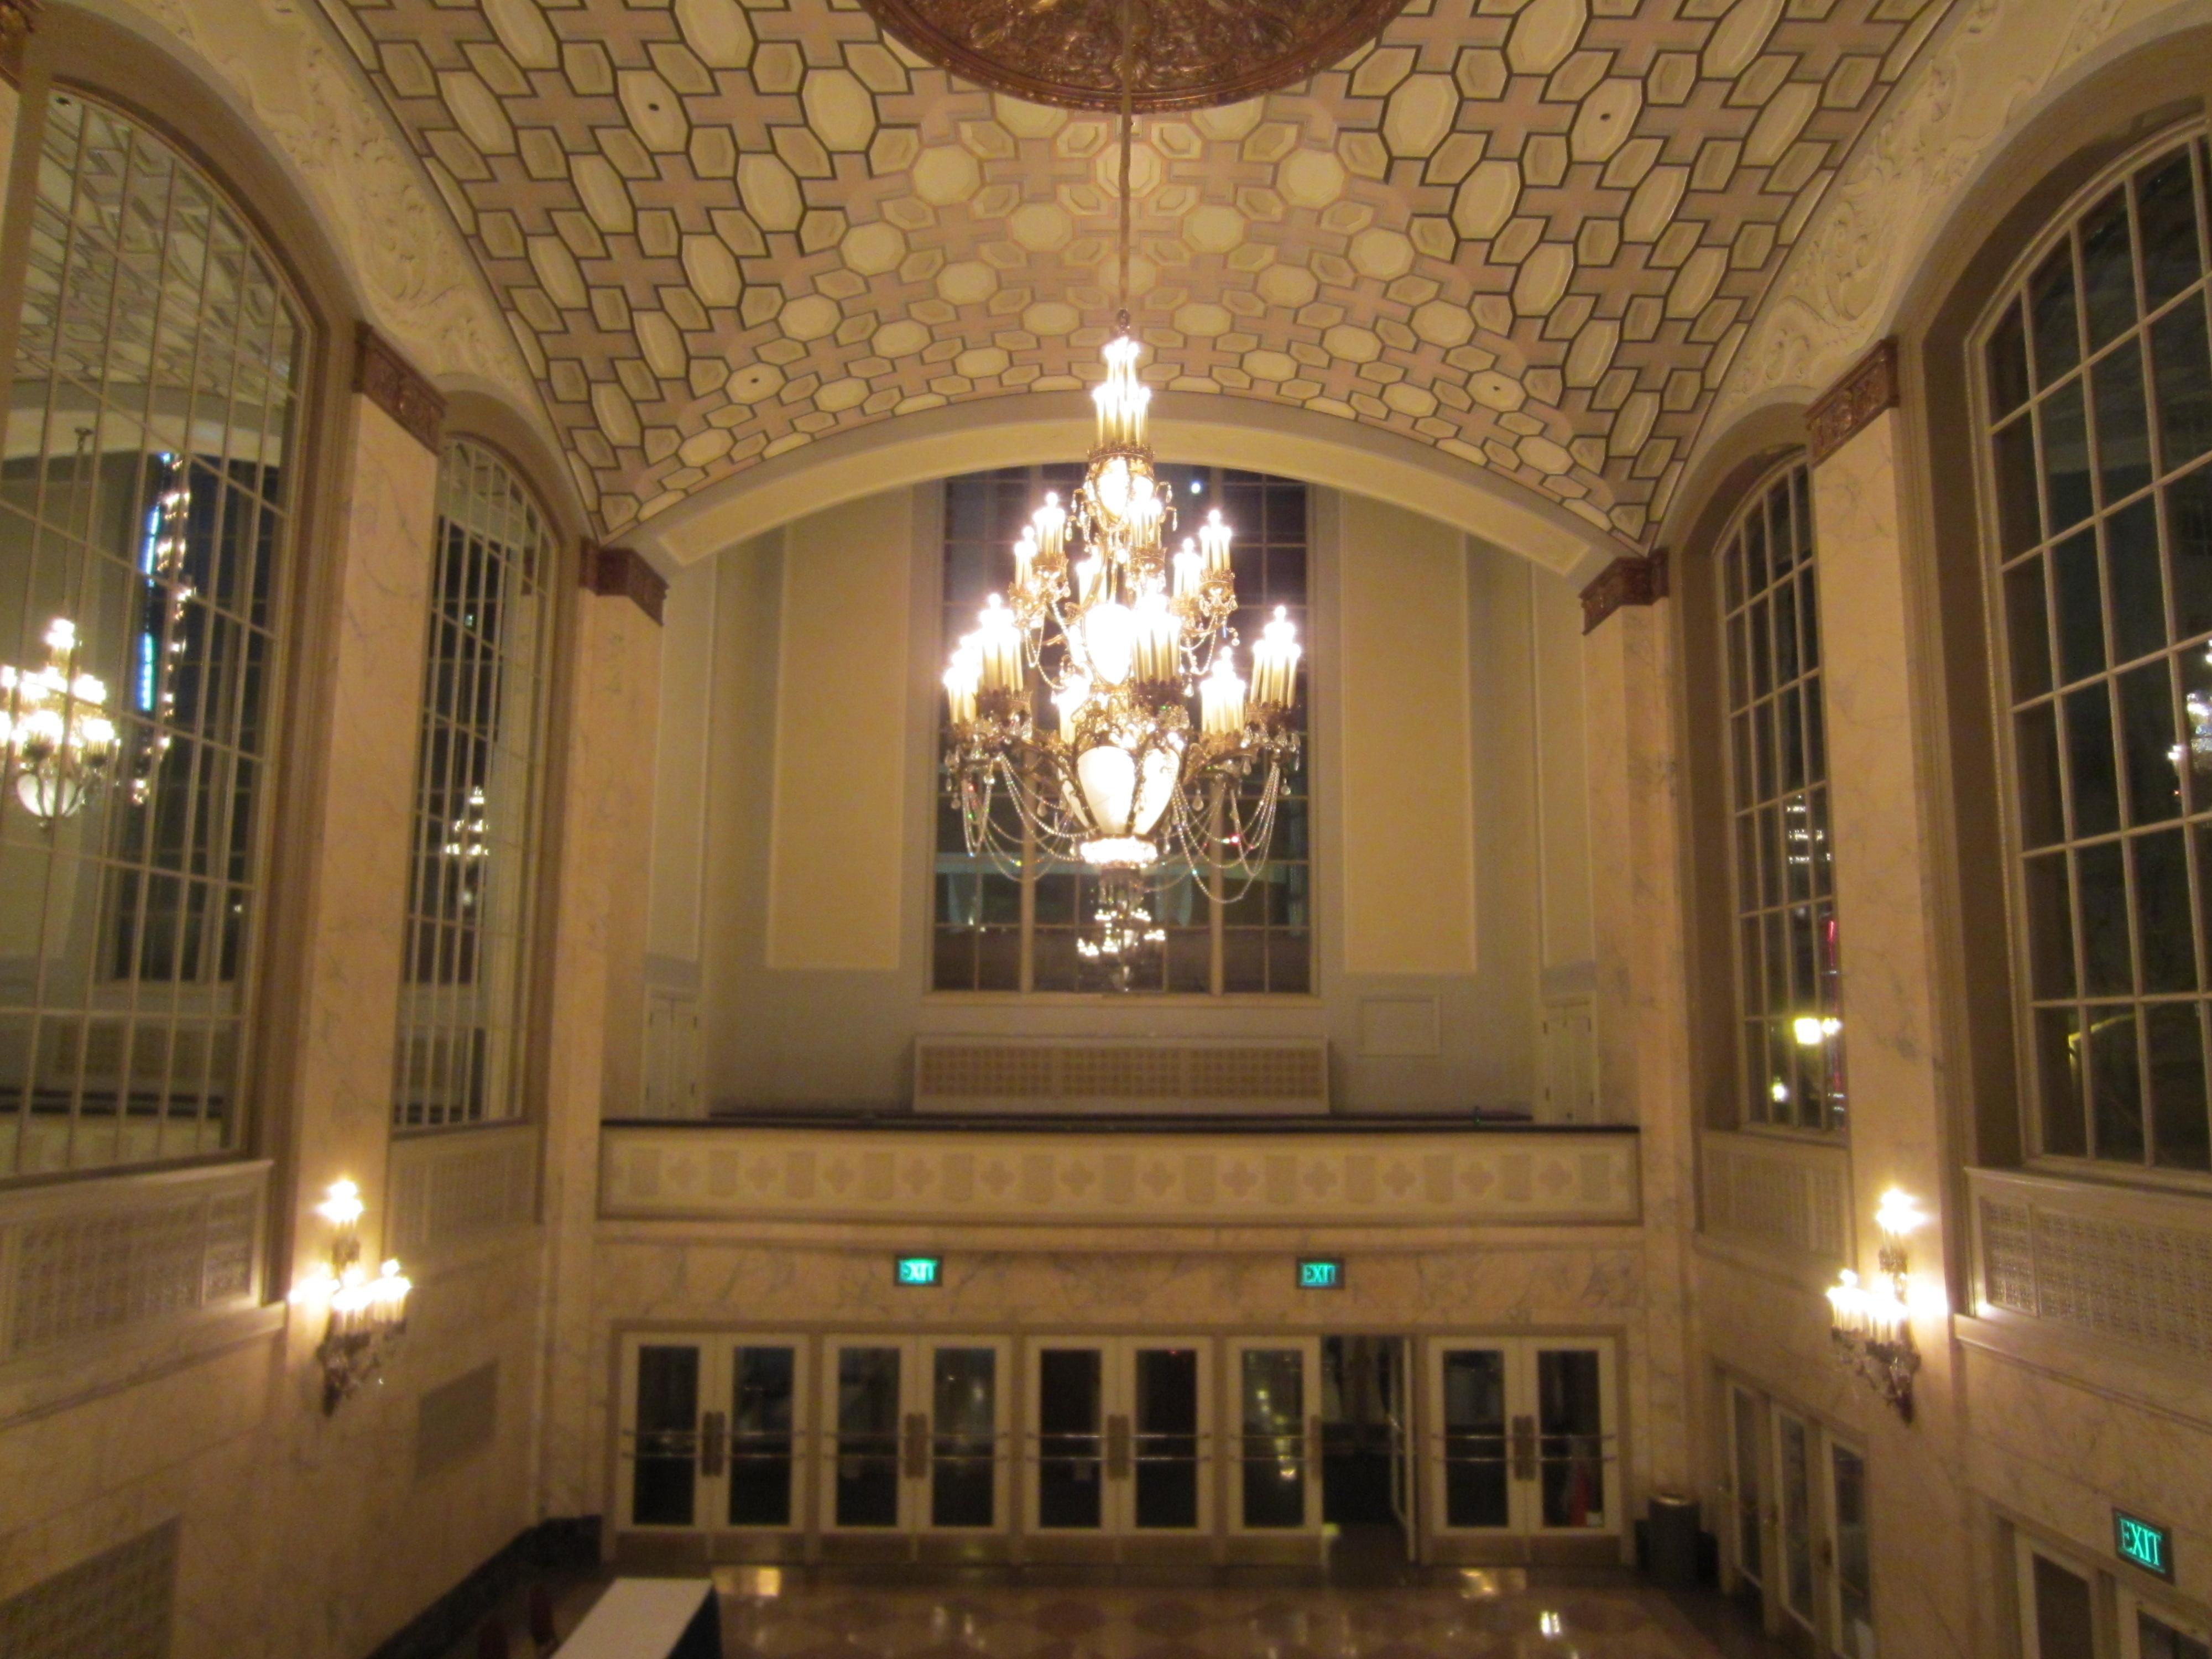 FileArlene Schnitzer Concert Hall Portland OR LobbyJPG - Arlene schnitzer concert hall portland oregon